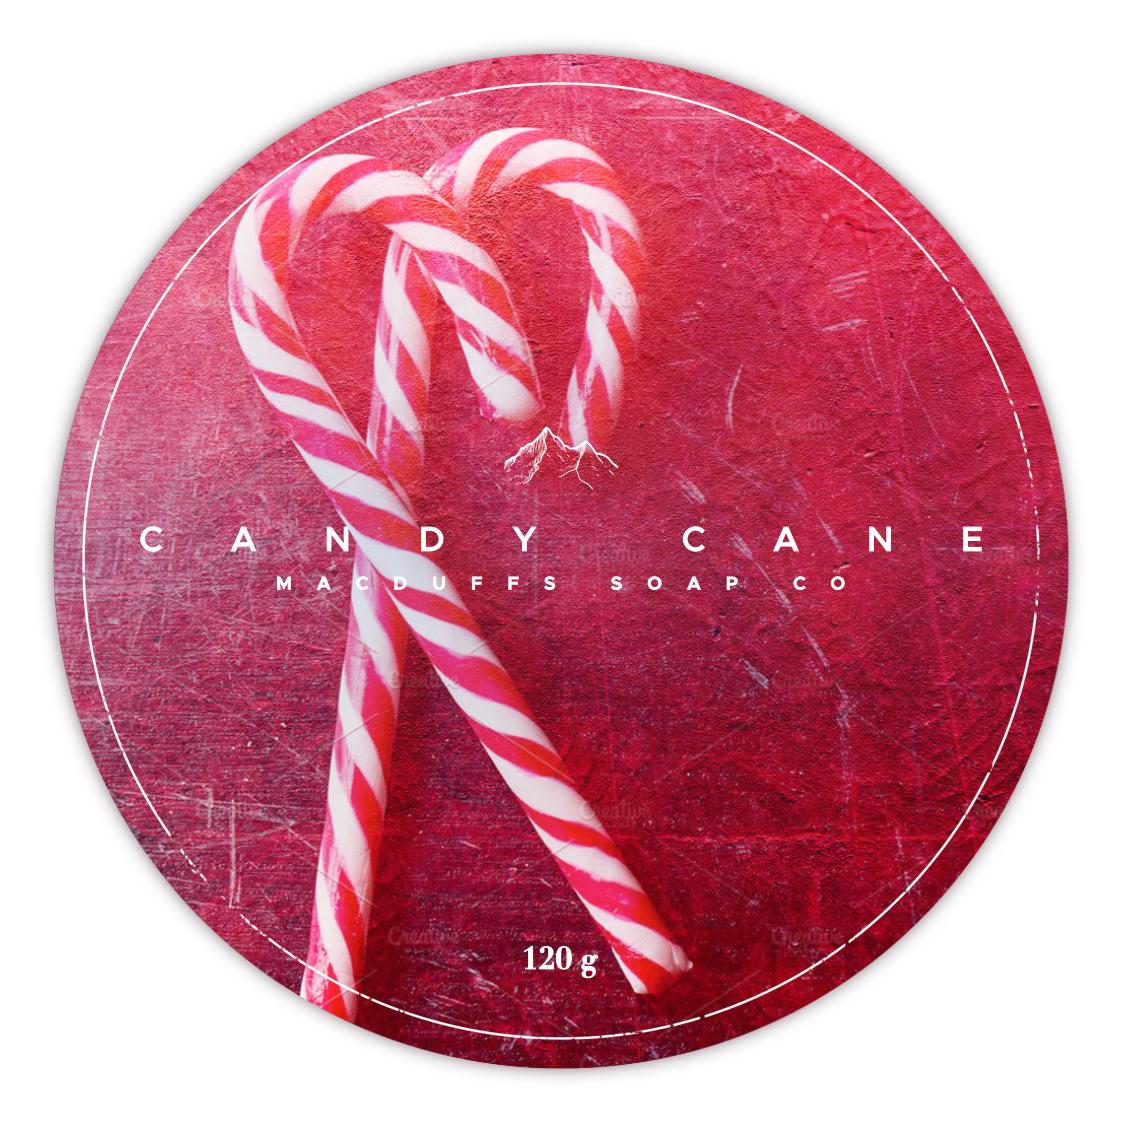 CANDY CANE SHAVE SOAP (NOVEMBER 12)